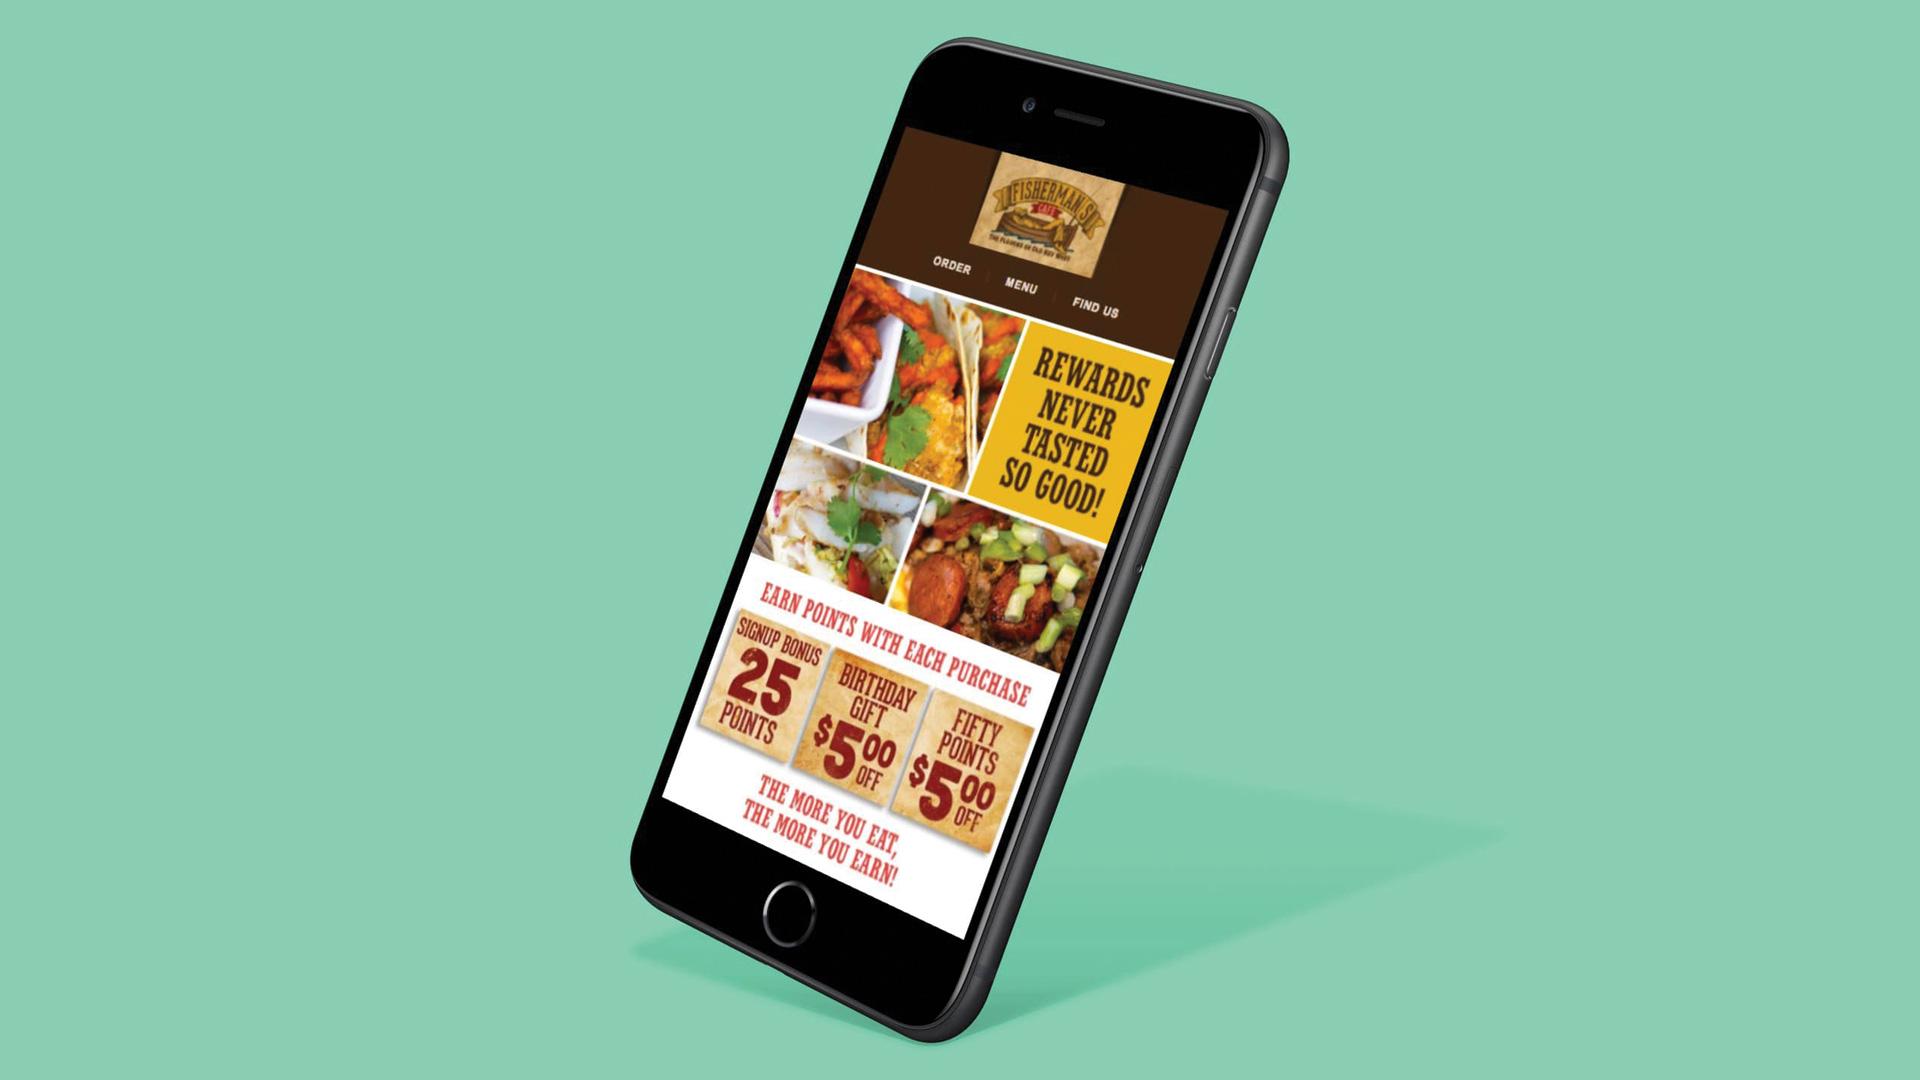 Phone displaying Fisherman's Cafe website